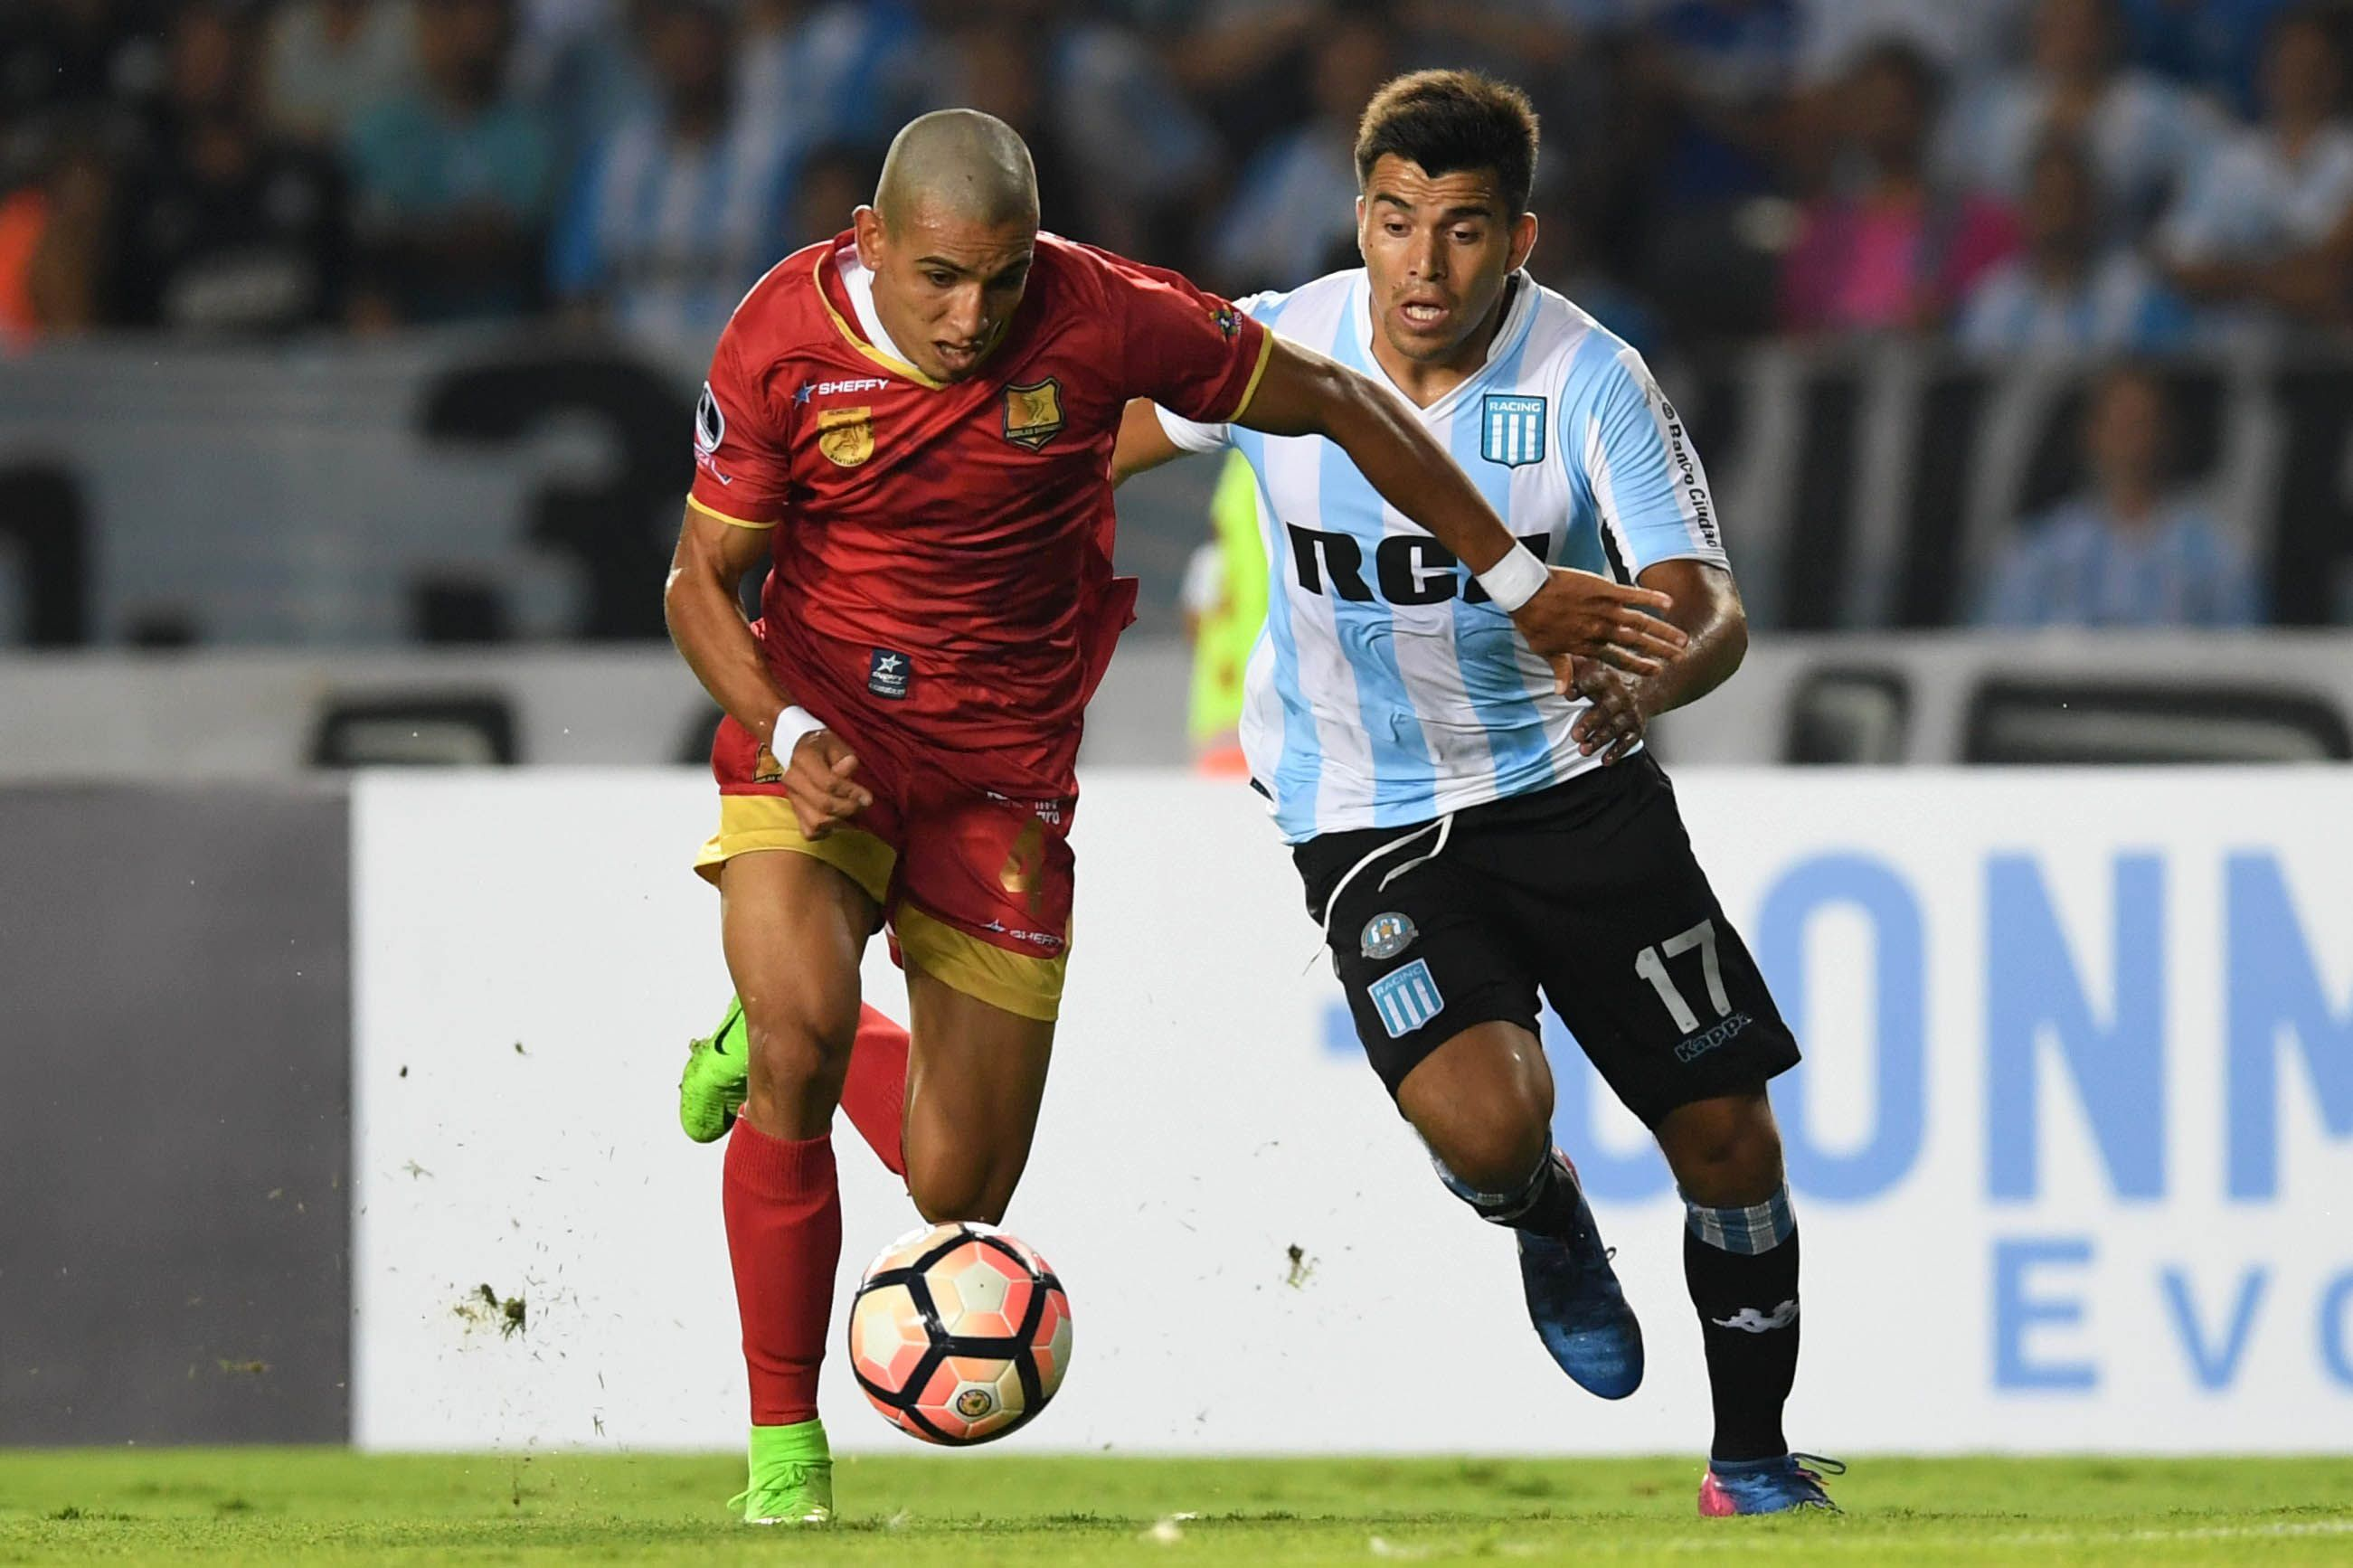 Racing recibe a Ríonegro Águilas en Avellaneda